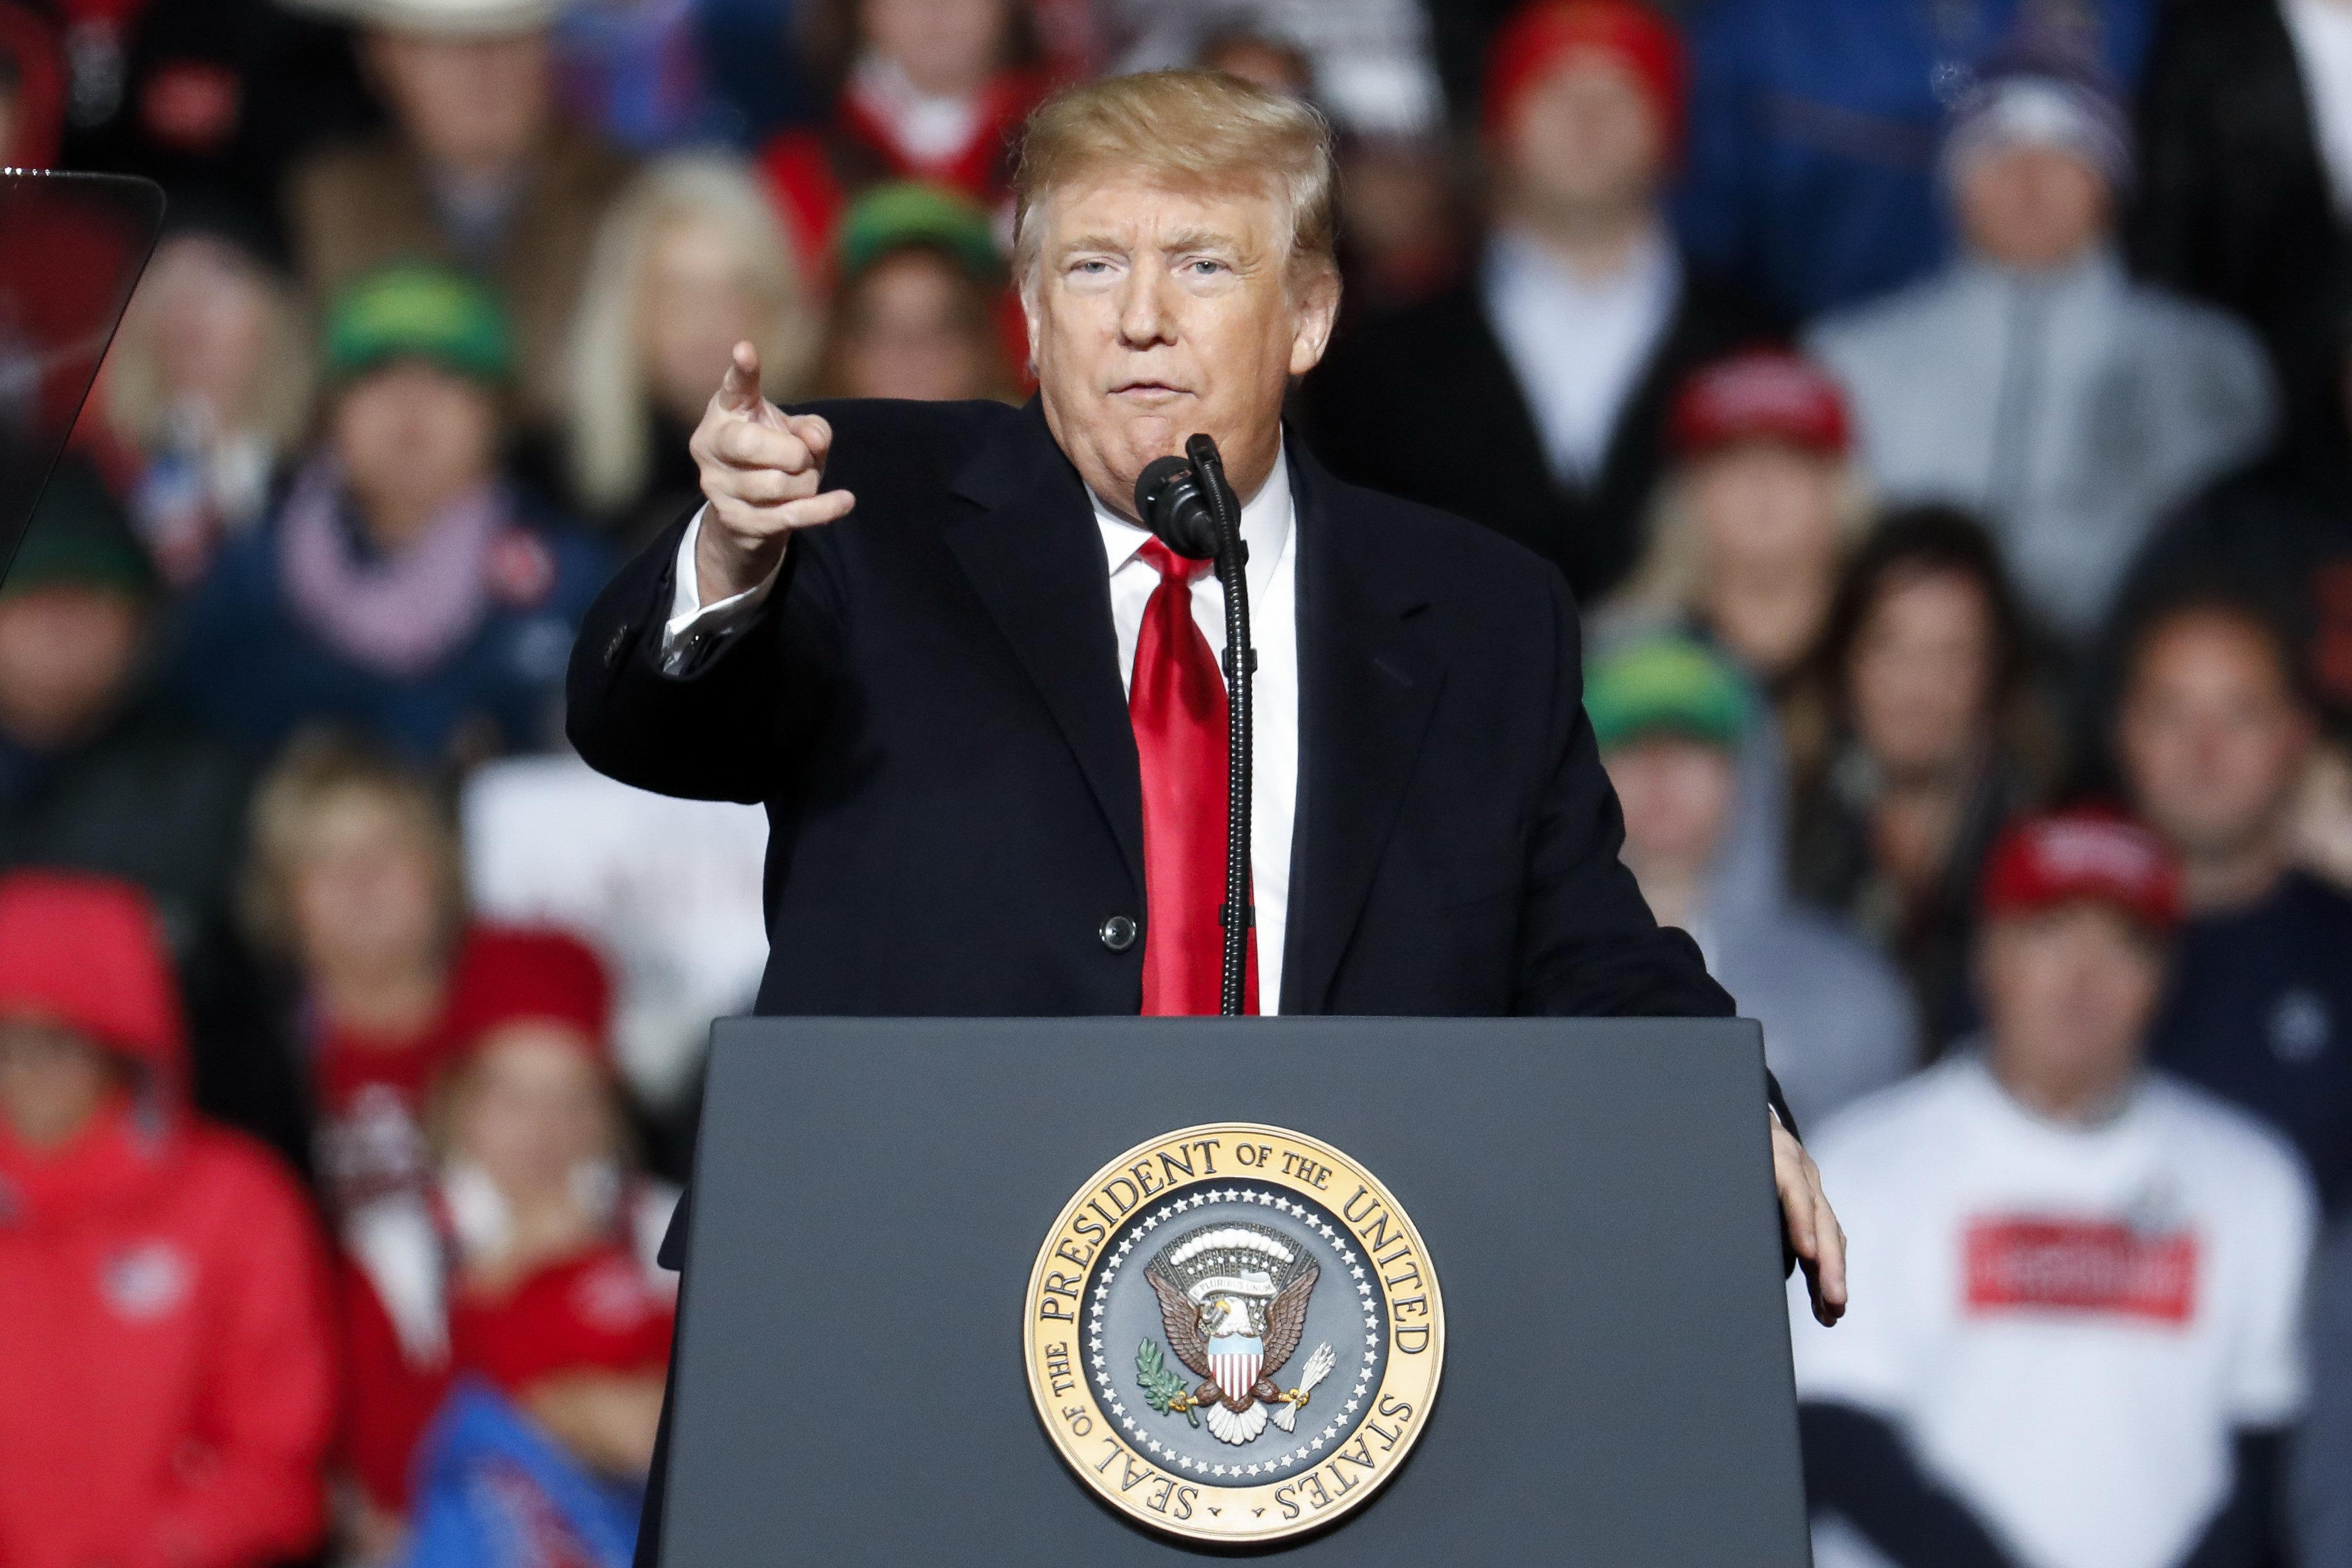 President Donald Trump speaks at a rally endorsing the Republican ticket, Friday, Oct. 12, 2018, in Lebanon, Ohio. (AP Photo/John Minchillo)